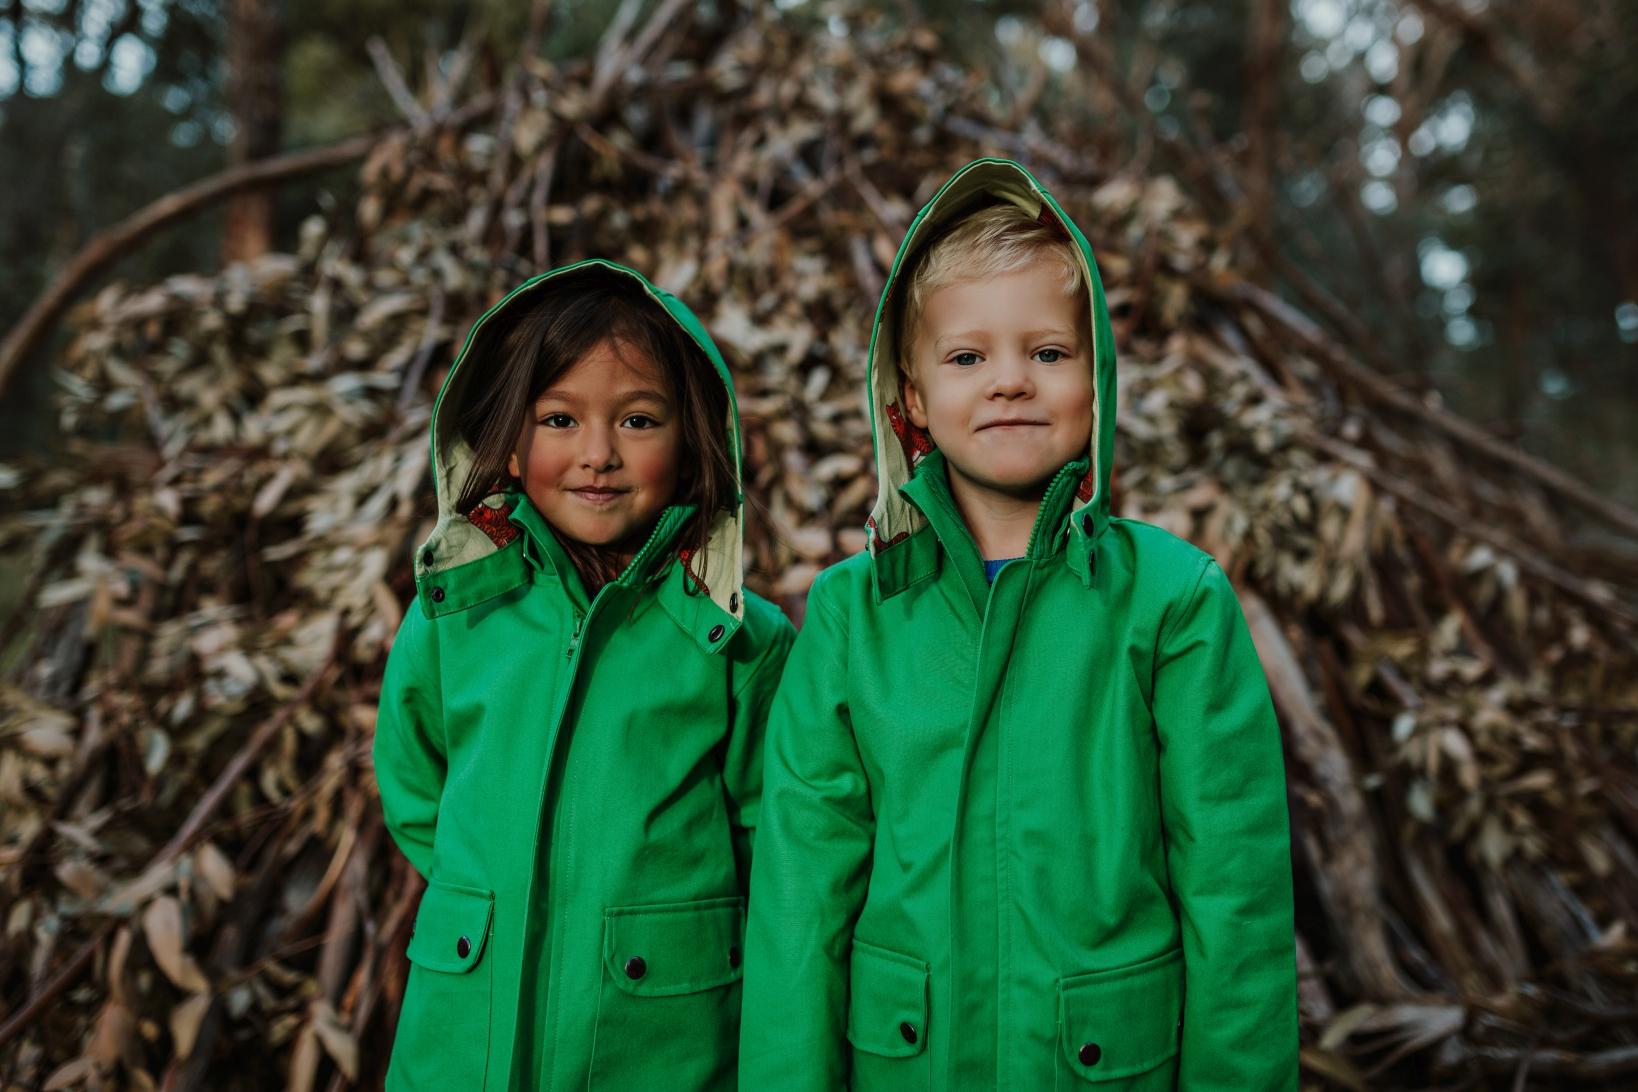 boy-girl-green-jackets-fashion-photography-siida.jpg